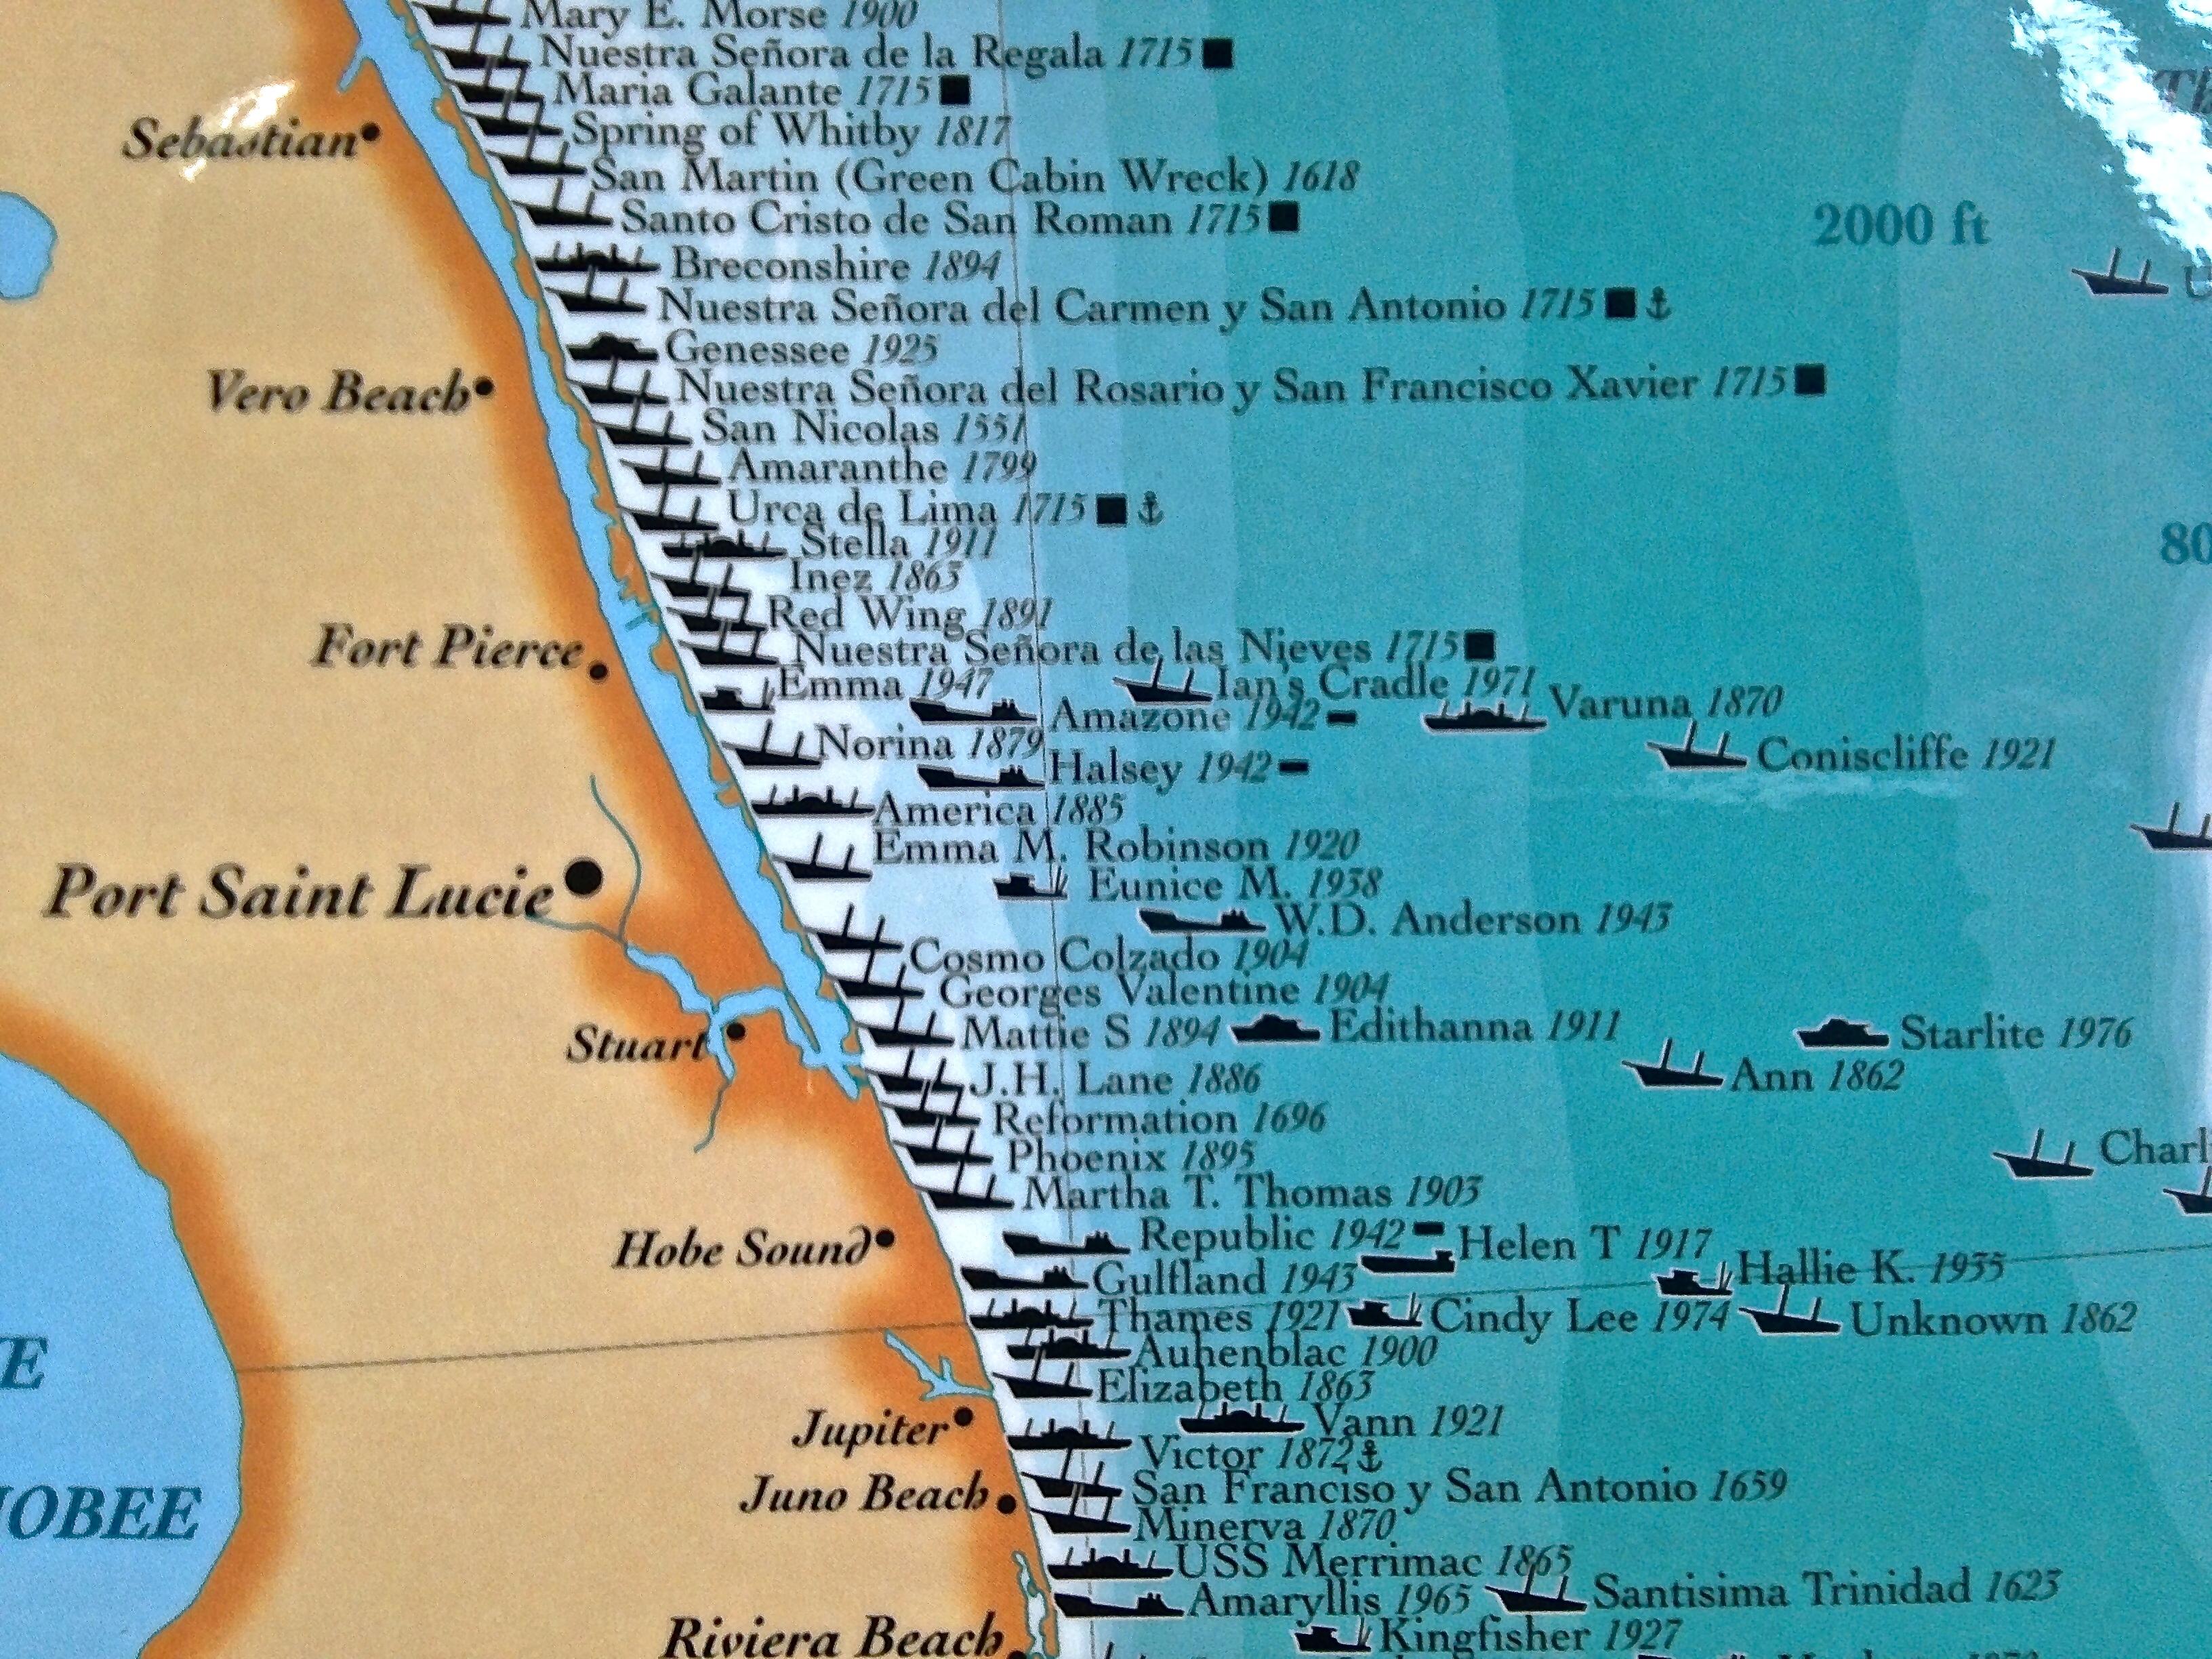 treasure coast ships map | Jacqui Thurlow-Lippisch